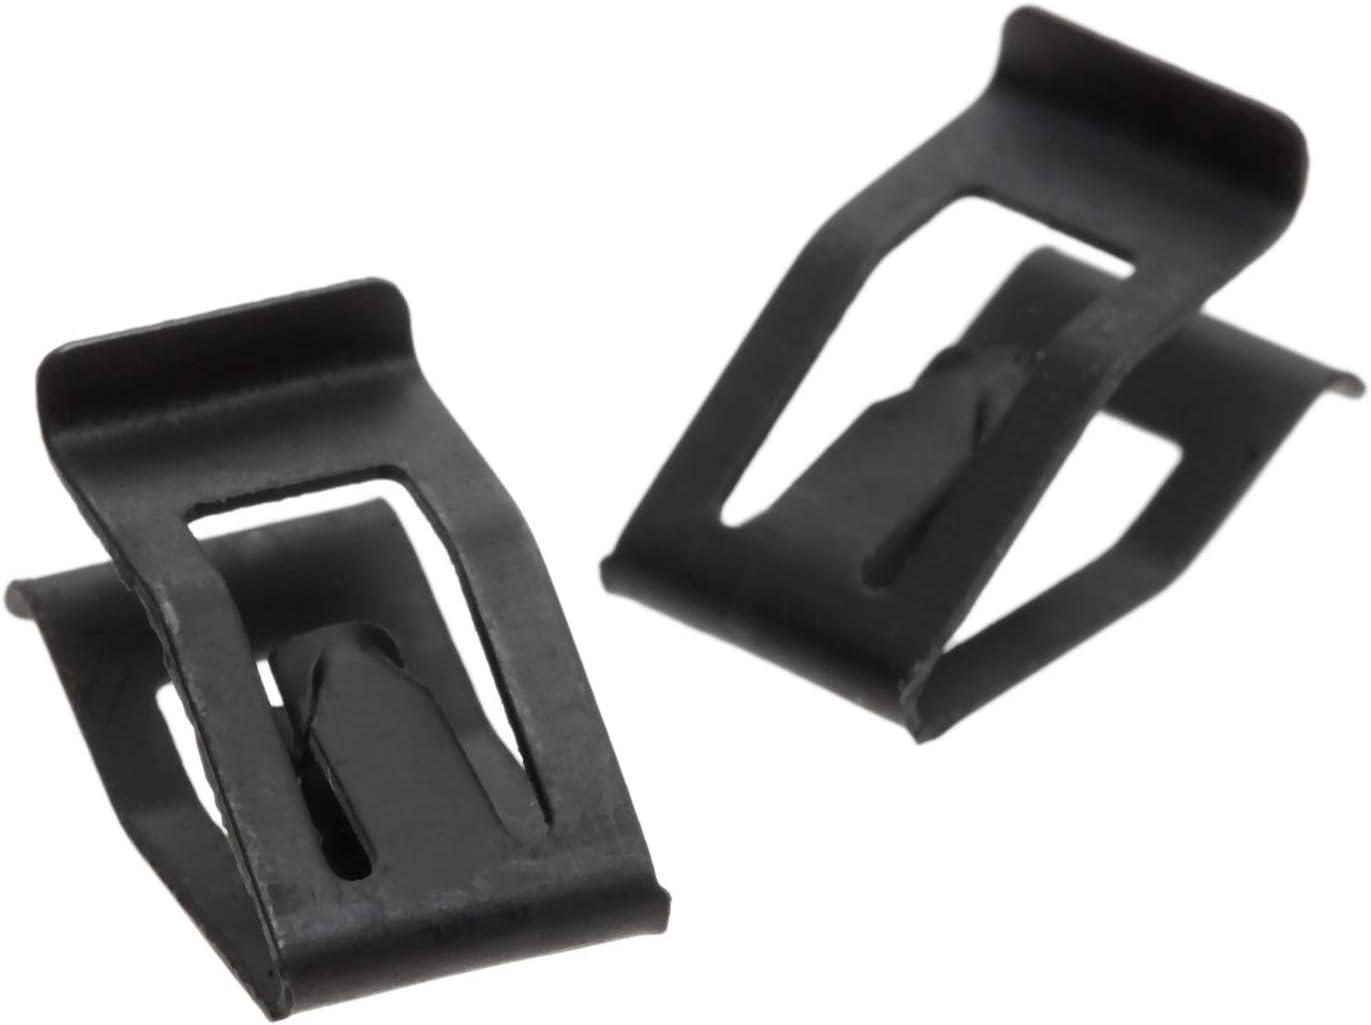 10pcs Console Avant Voiture Universel Dash Dashboard Auto Trim Retenue Black Metal Rivet Clip Fastener for Ford Mazda Audi Toyota Size : 10PCS